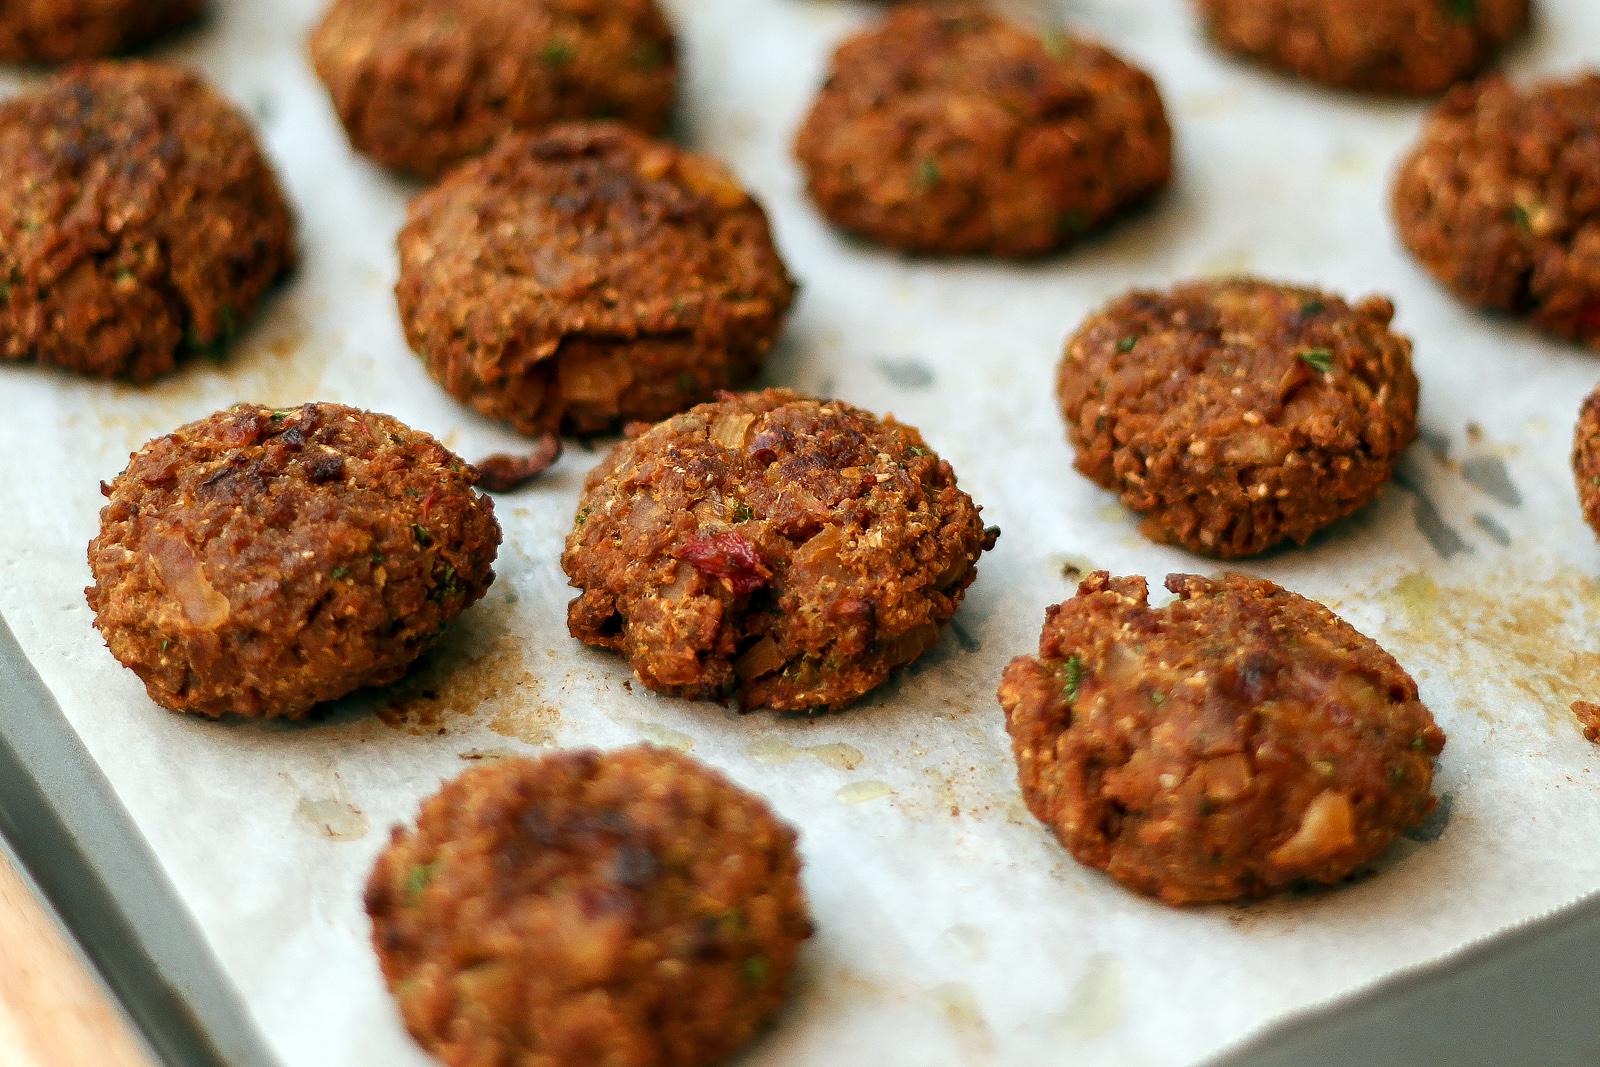 Vegetarian Rissoles with Textured Vegetable Protein (TVP)